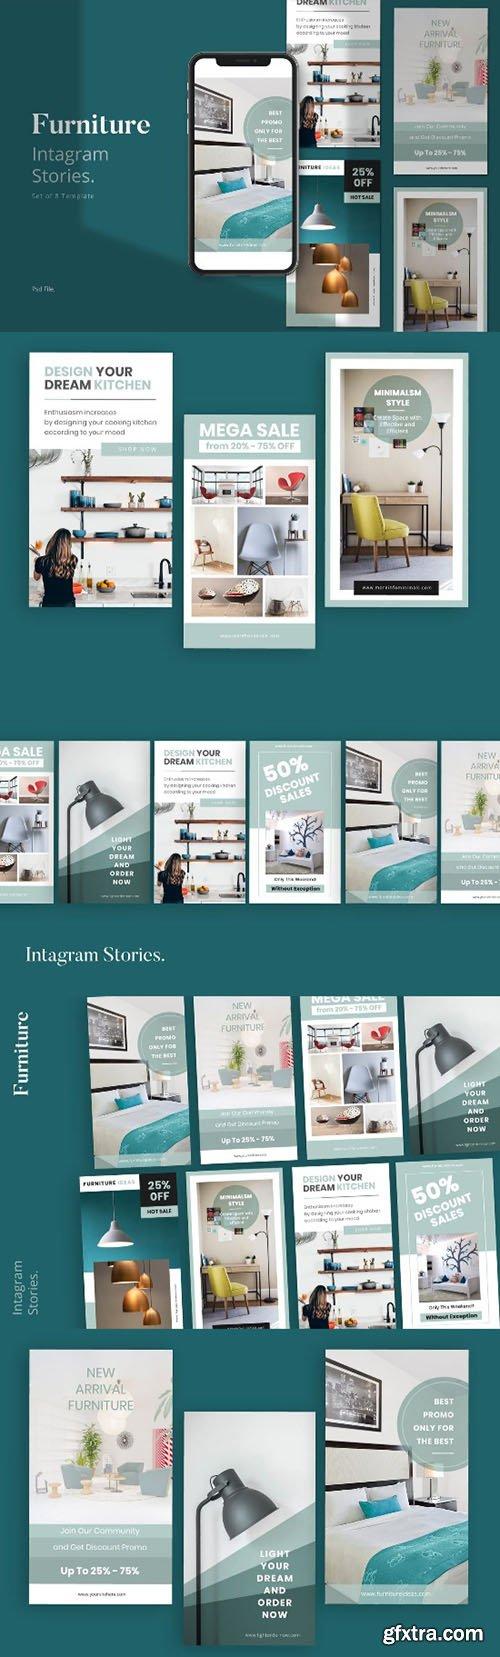 Furniture Social Media Instagram Stories Template